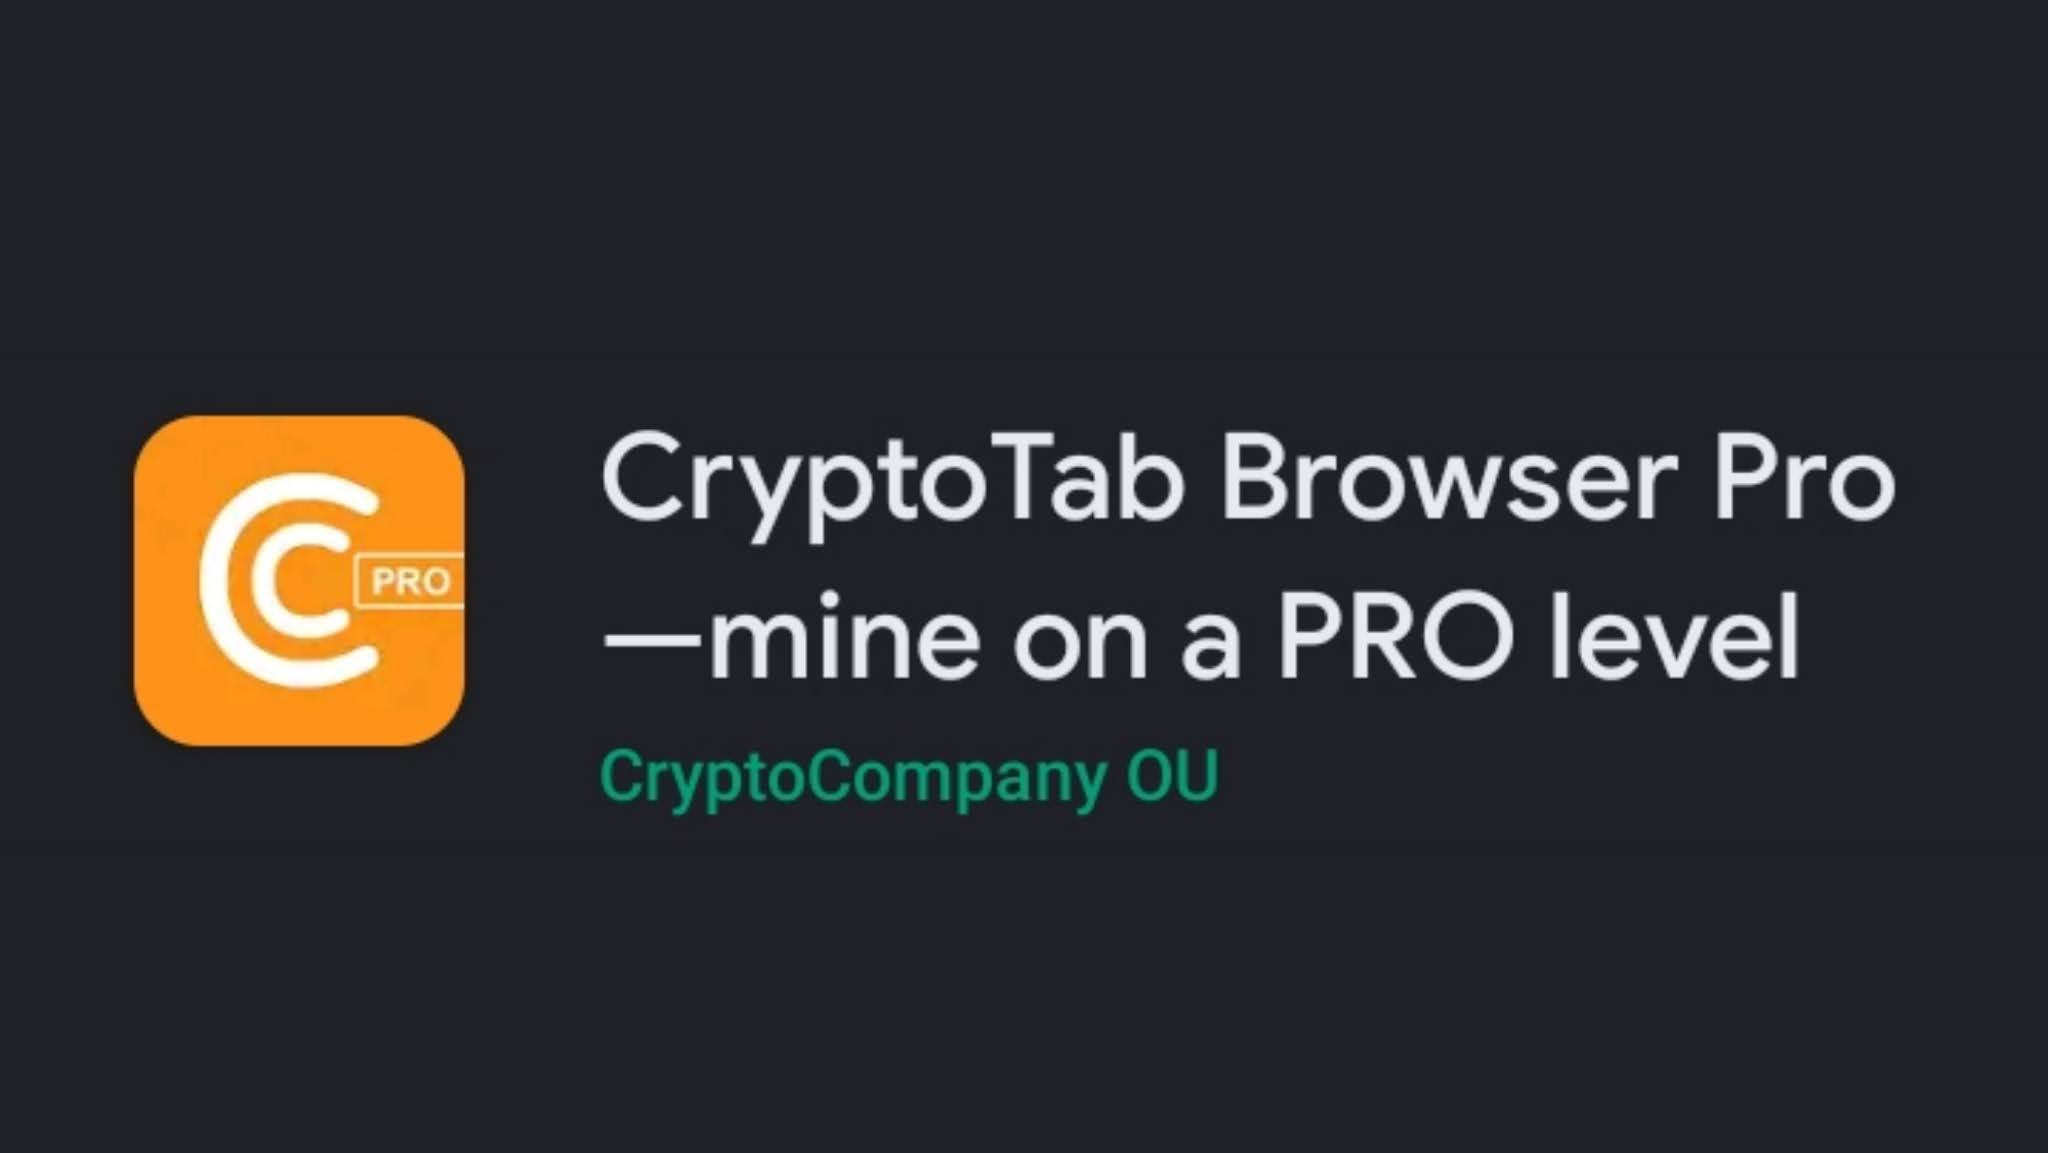 Download gratuito per CryptoTab Pro Mod APK per Android